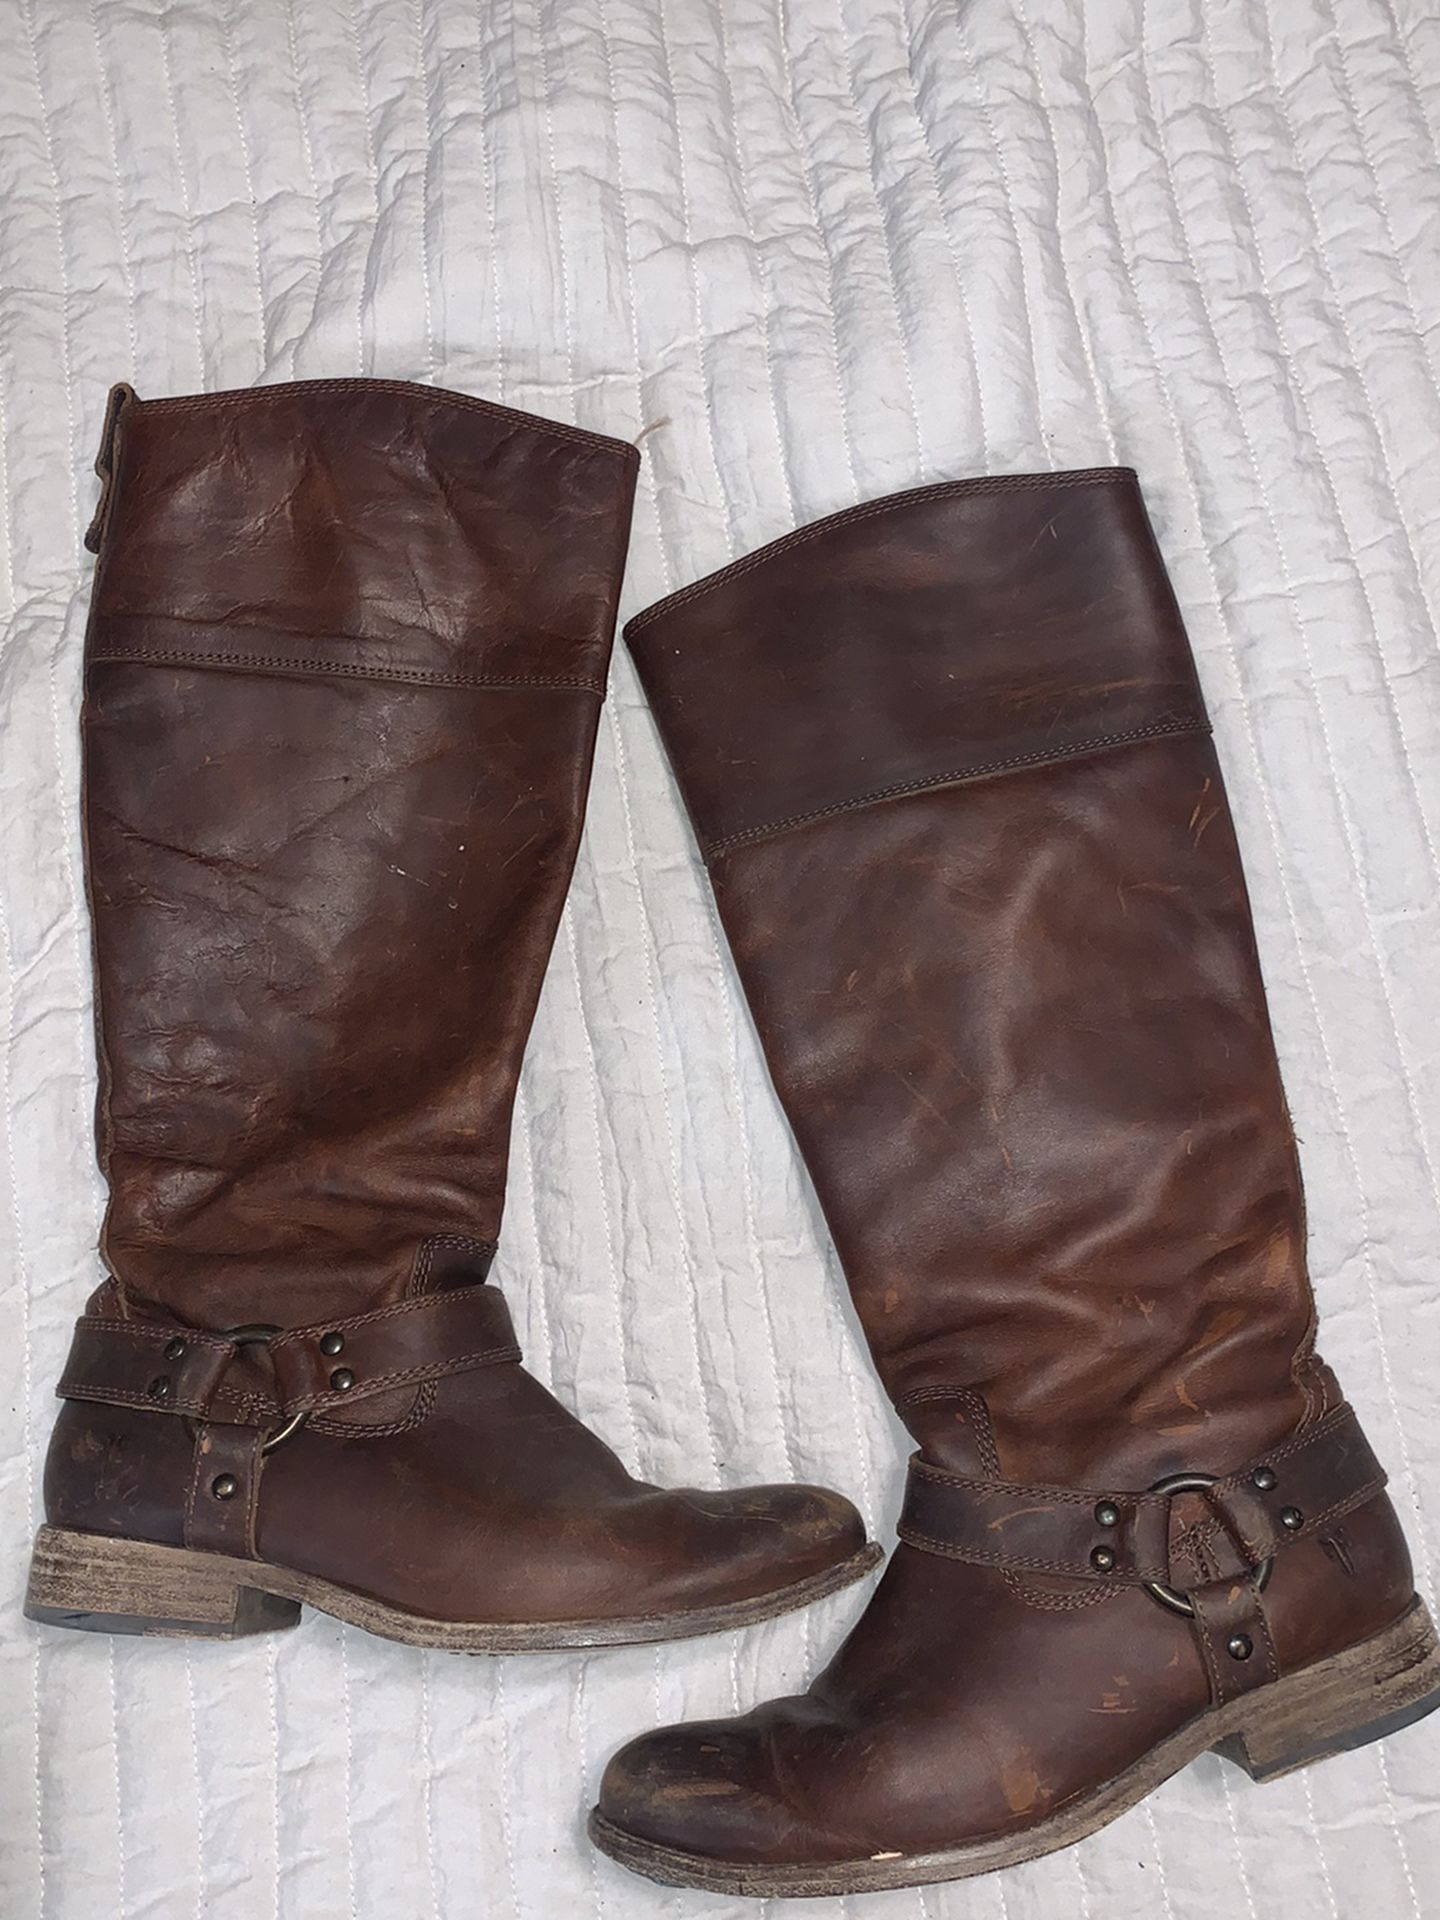 Women's Frye Riding Boots Size 6